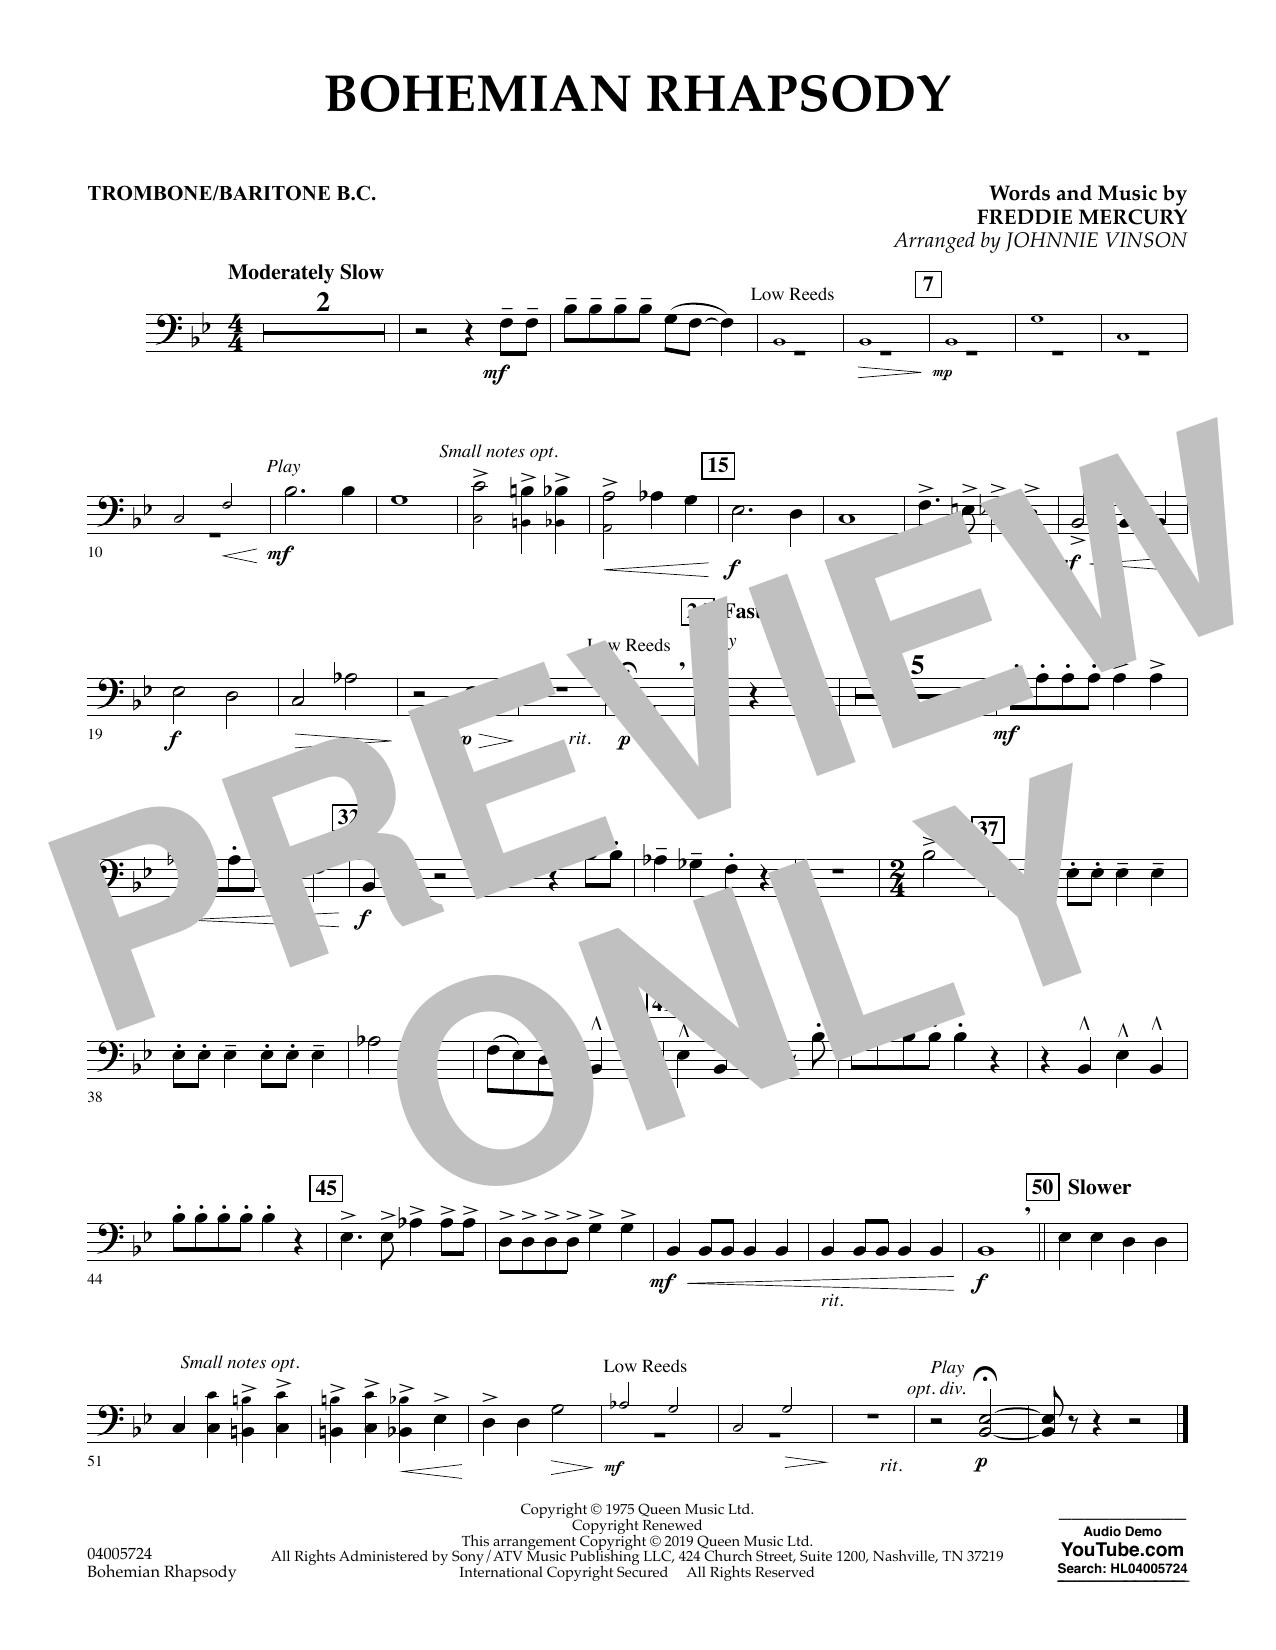 Bohemian Rhapsody (arr. Johnnie Vinson) - Trombone/Baritone B.C. (Concert Band)